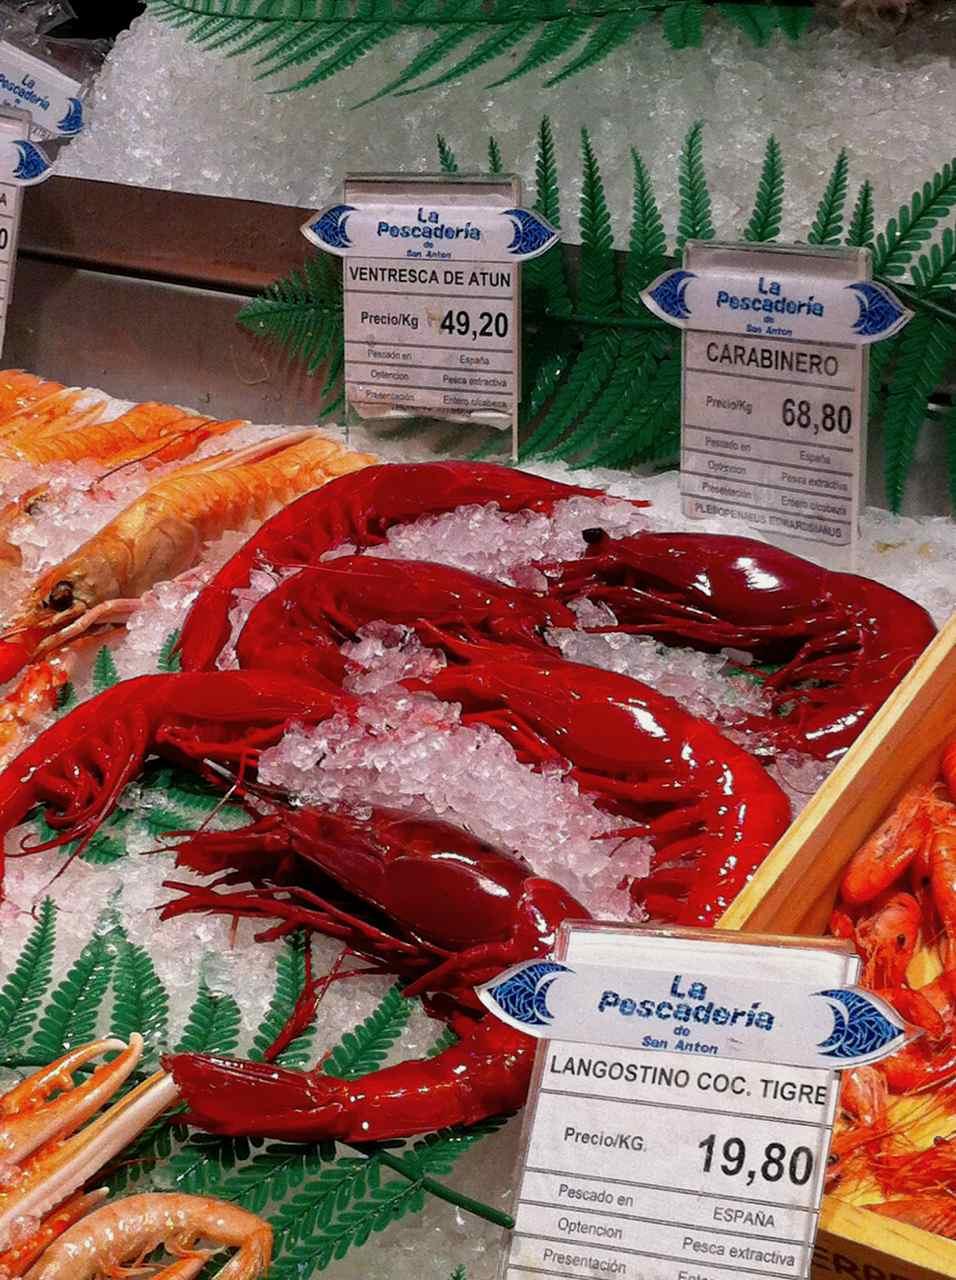 Seafood at Mercado de San Miguel in Madrid Spain | www.rtwgirl.com